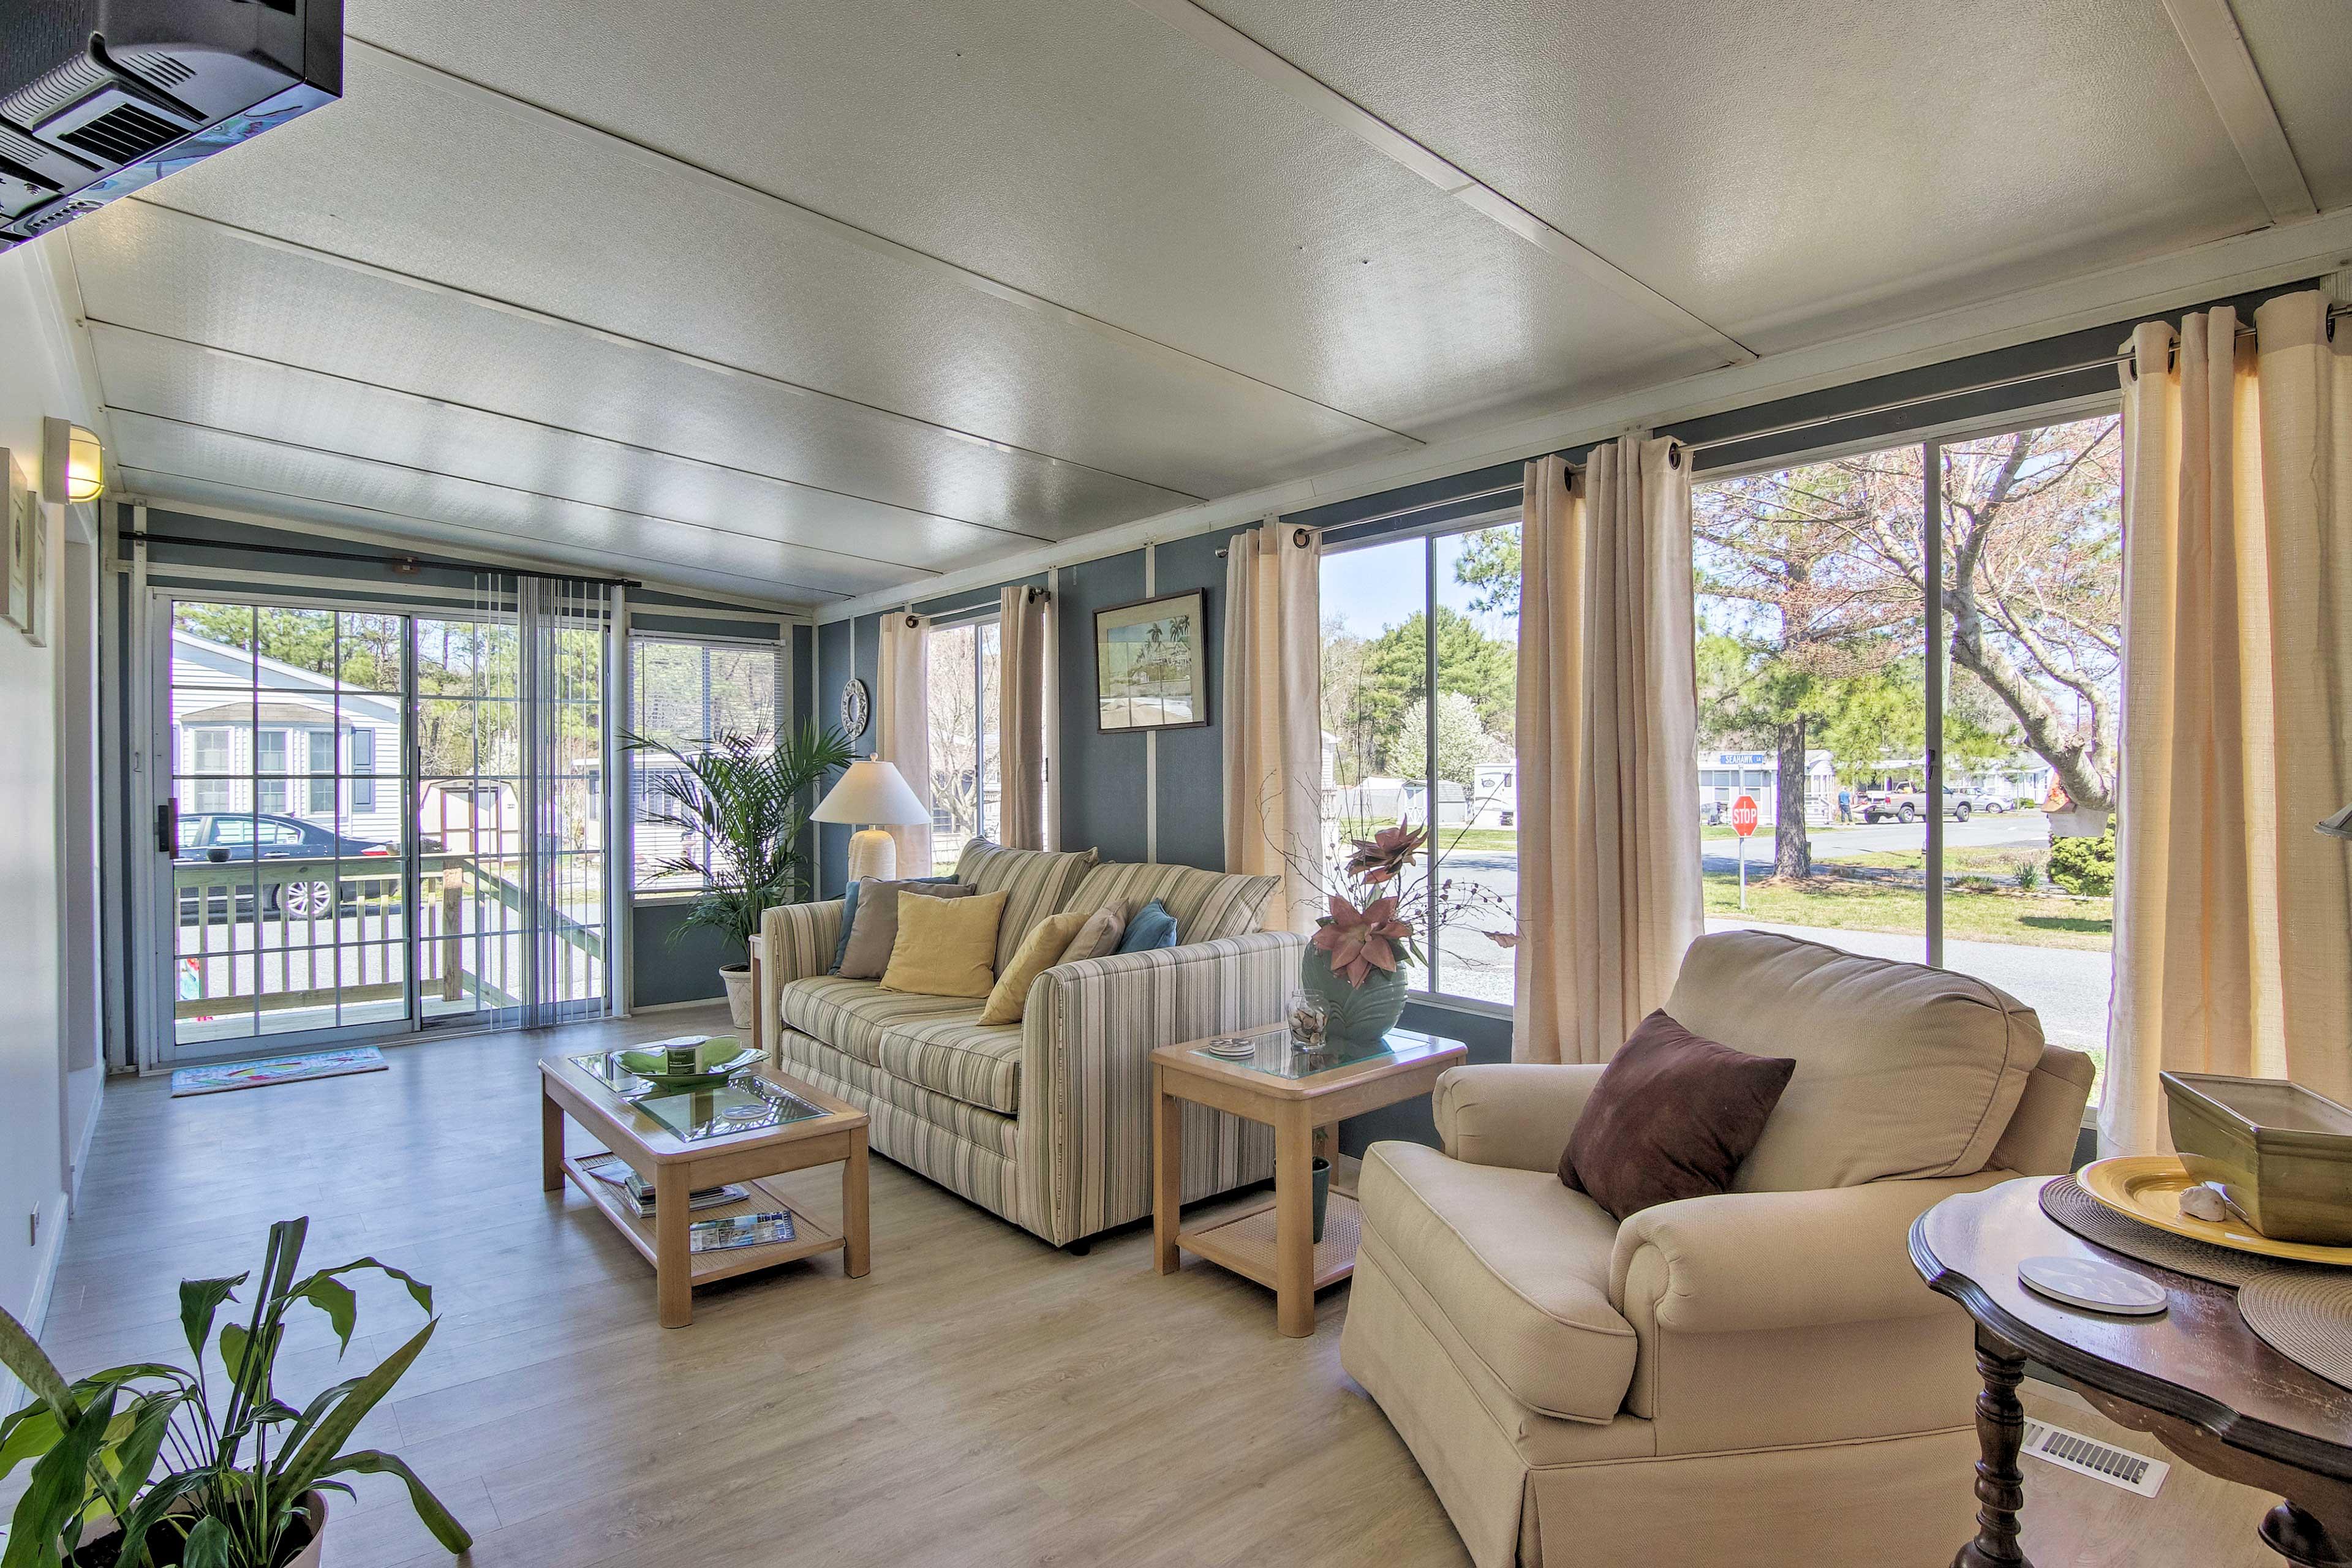 An abundance of windows illumiante the modern living space.